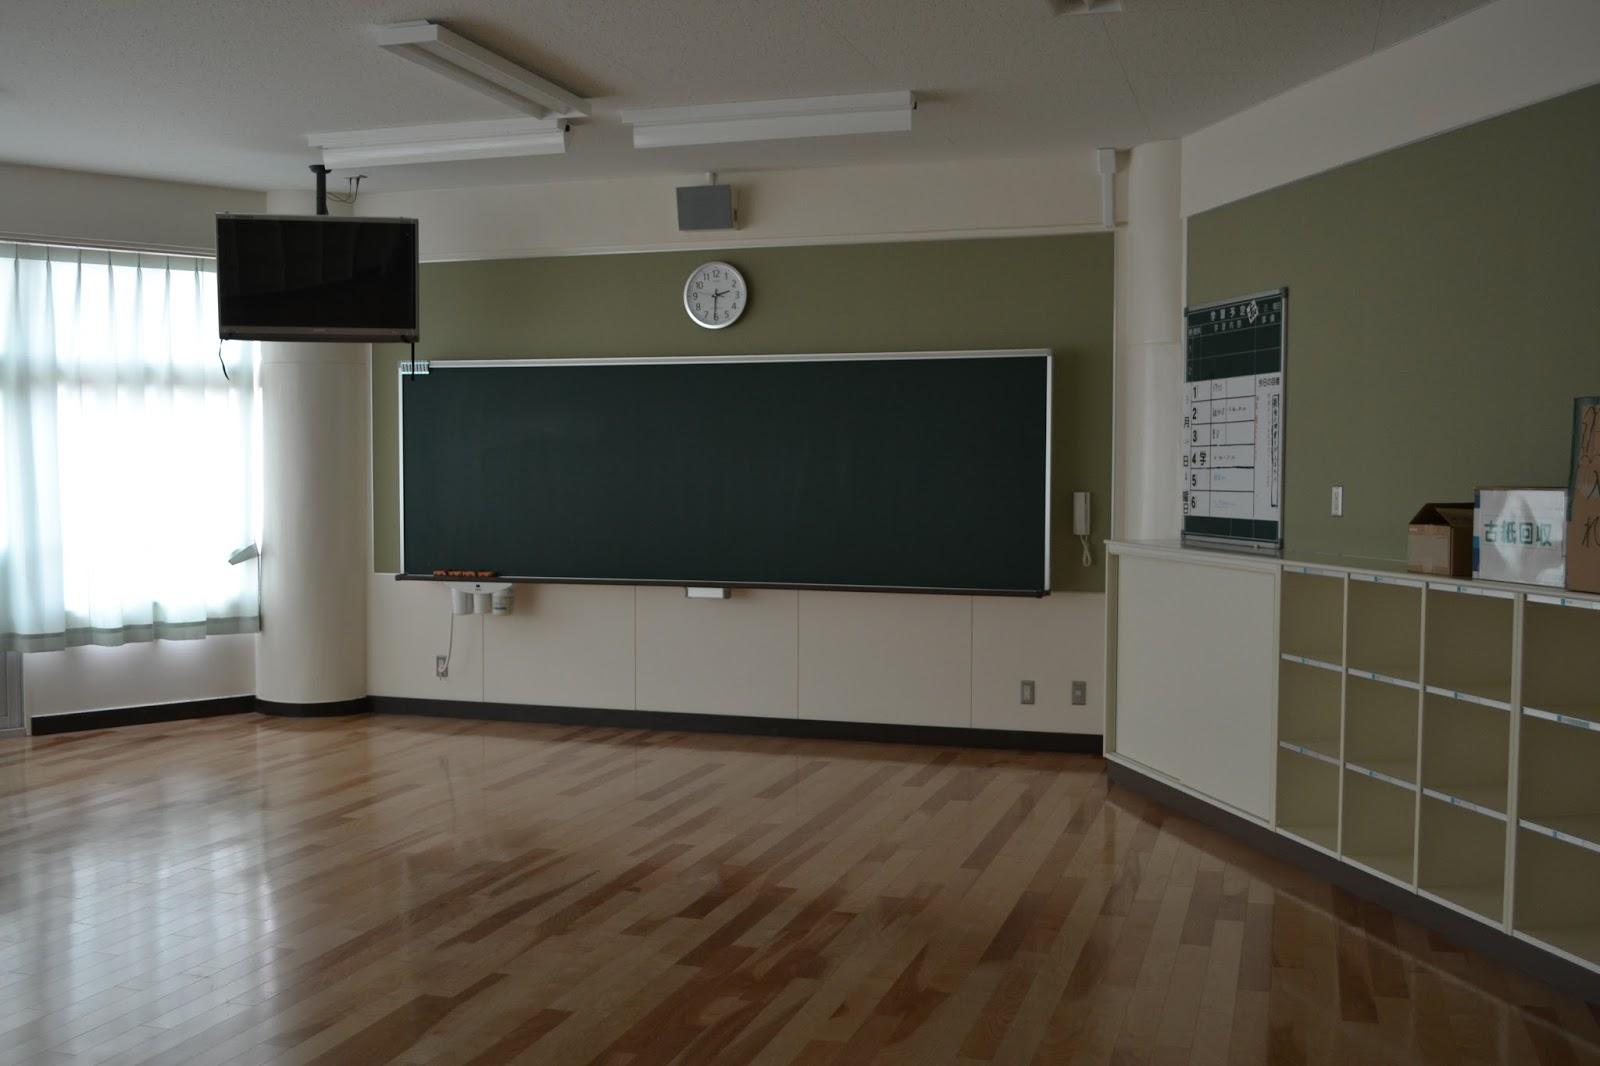 Elementary Classrooms Without Desks ~ Classroom without desks desk design ideas